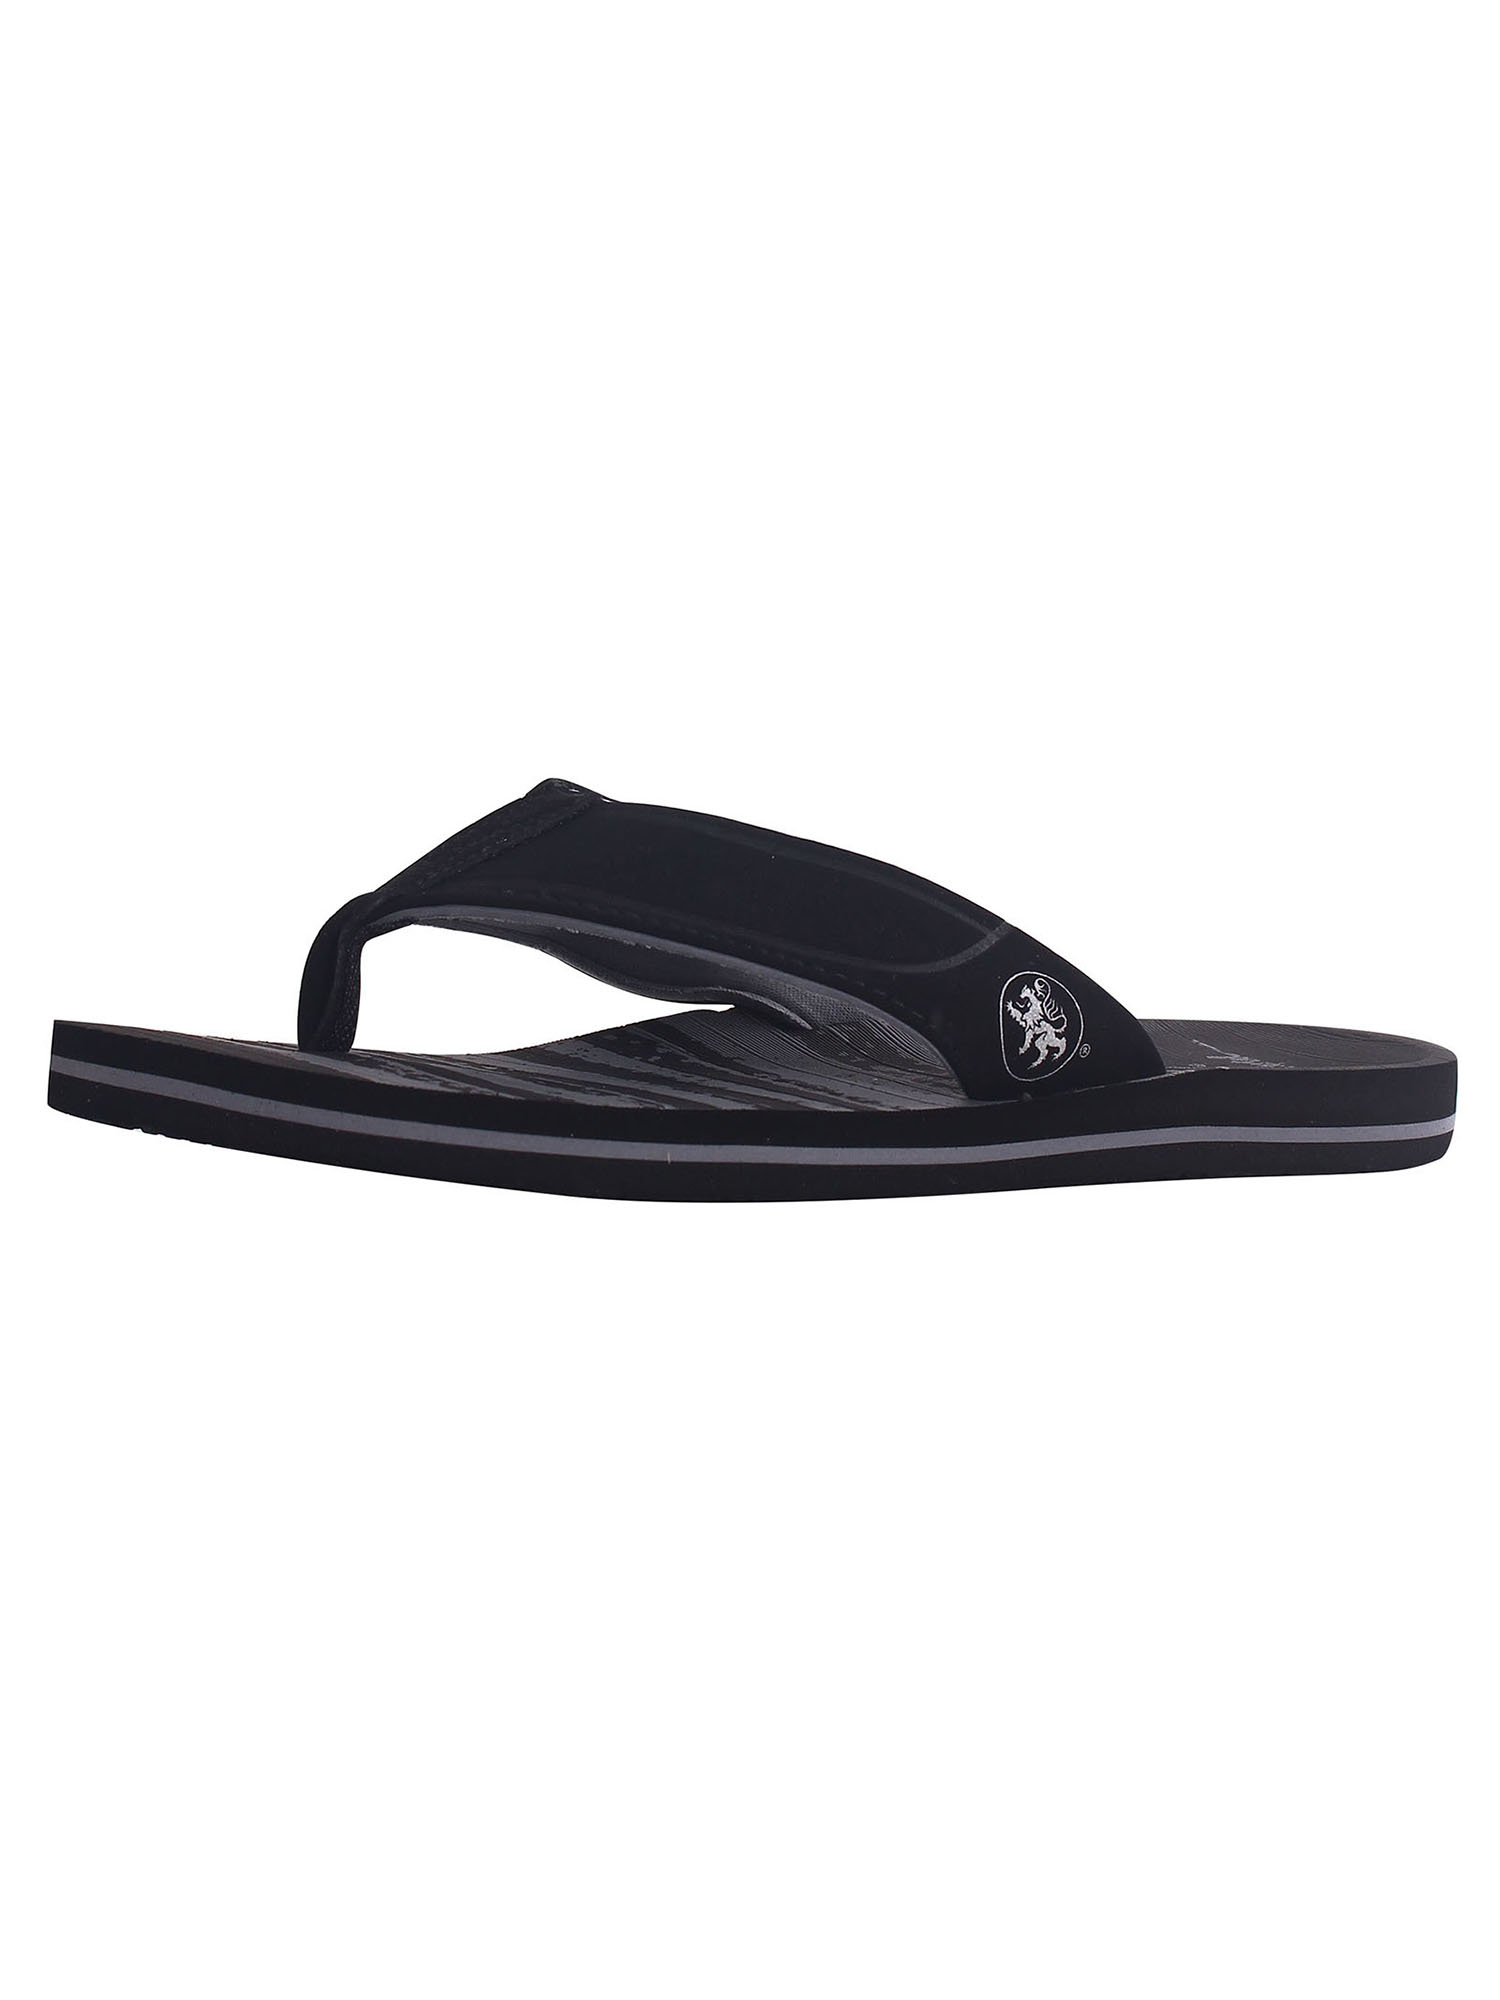 Men's Athletic Strap Poolside Casual Beach Flip Flop Sandals, Black/Grey, 9